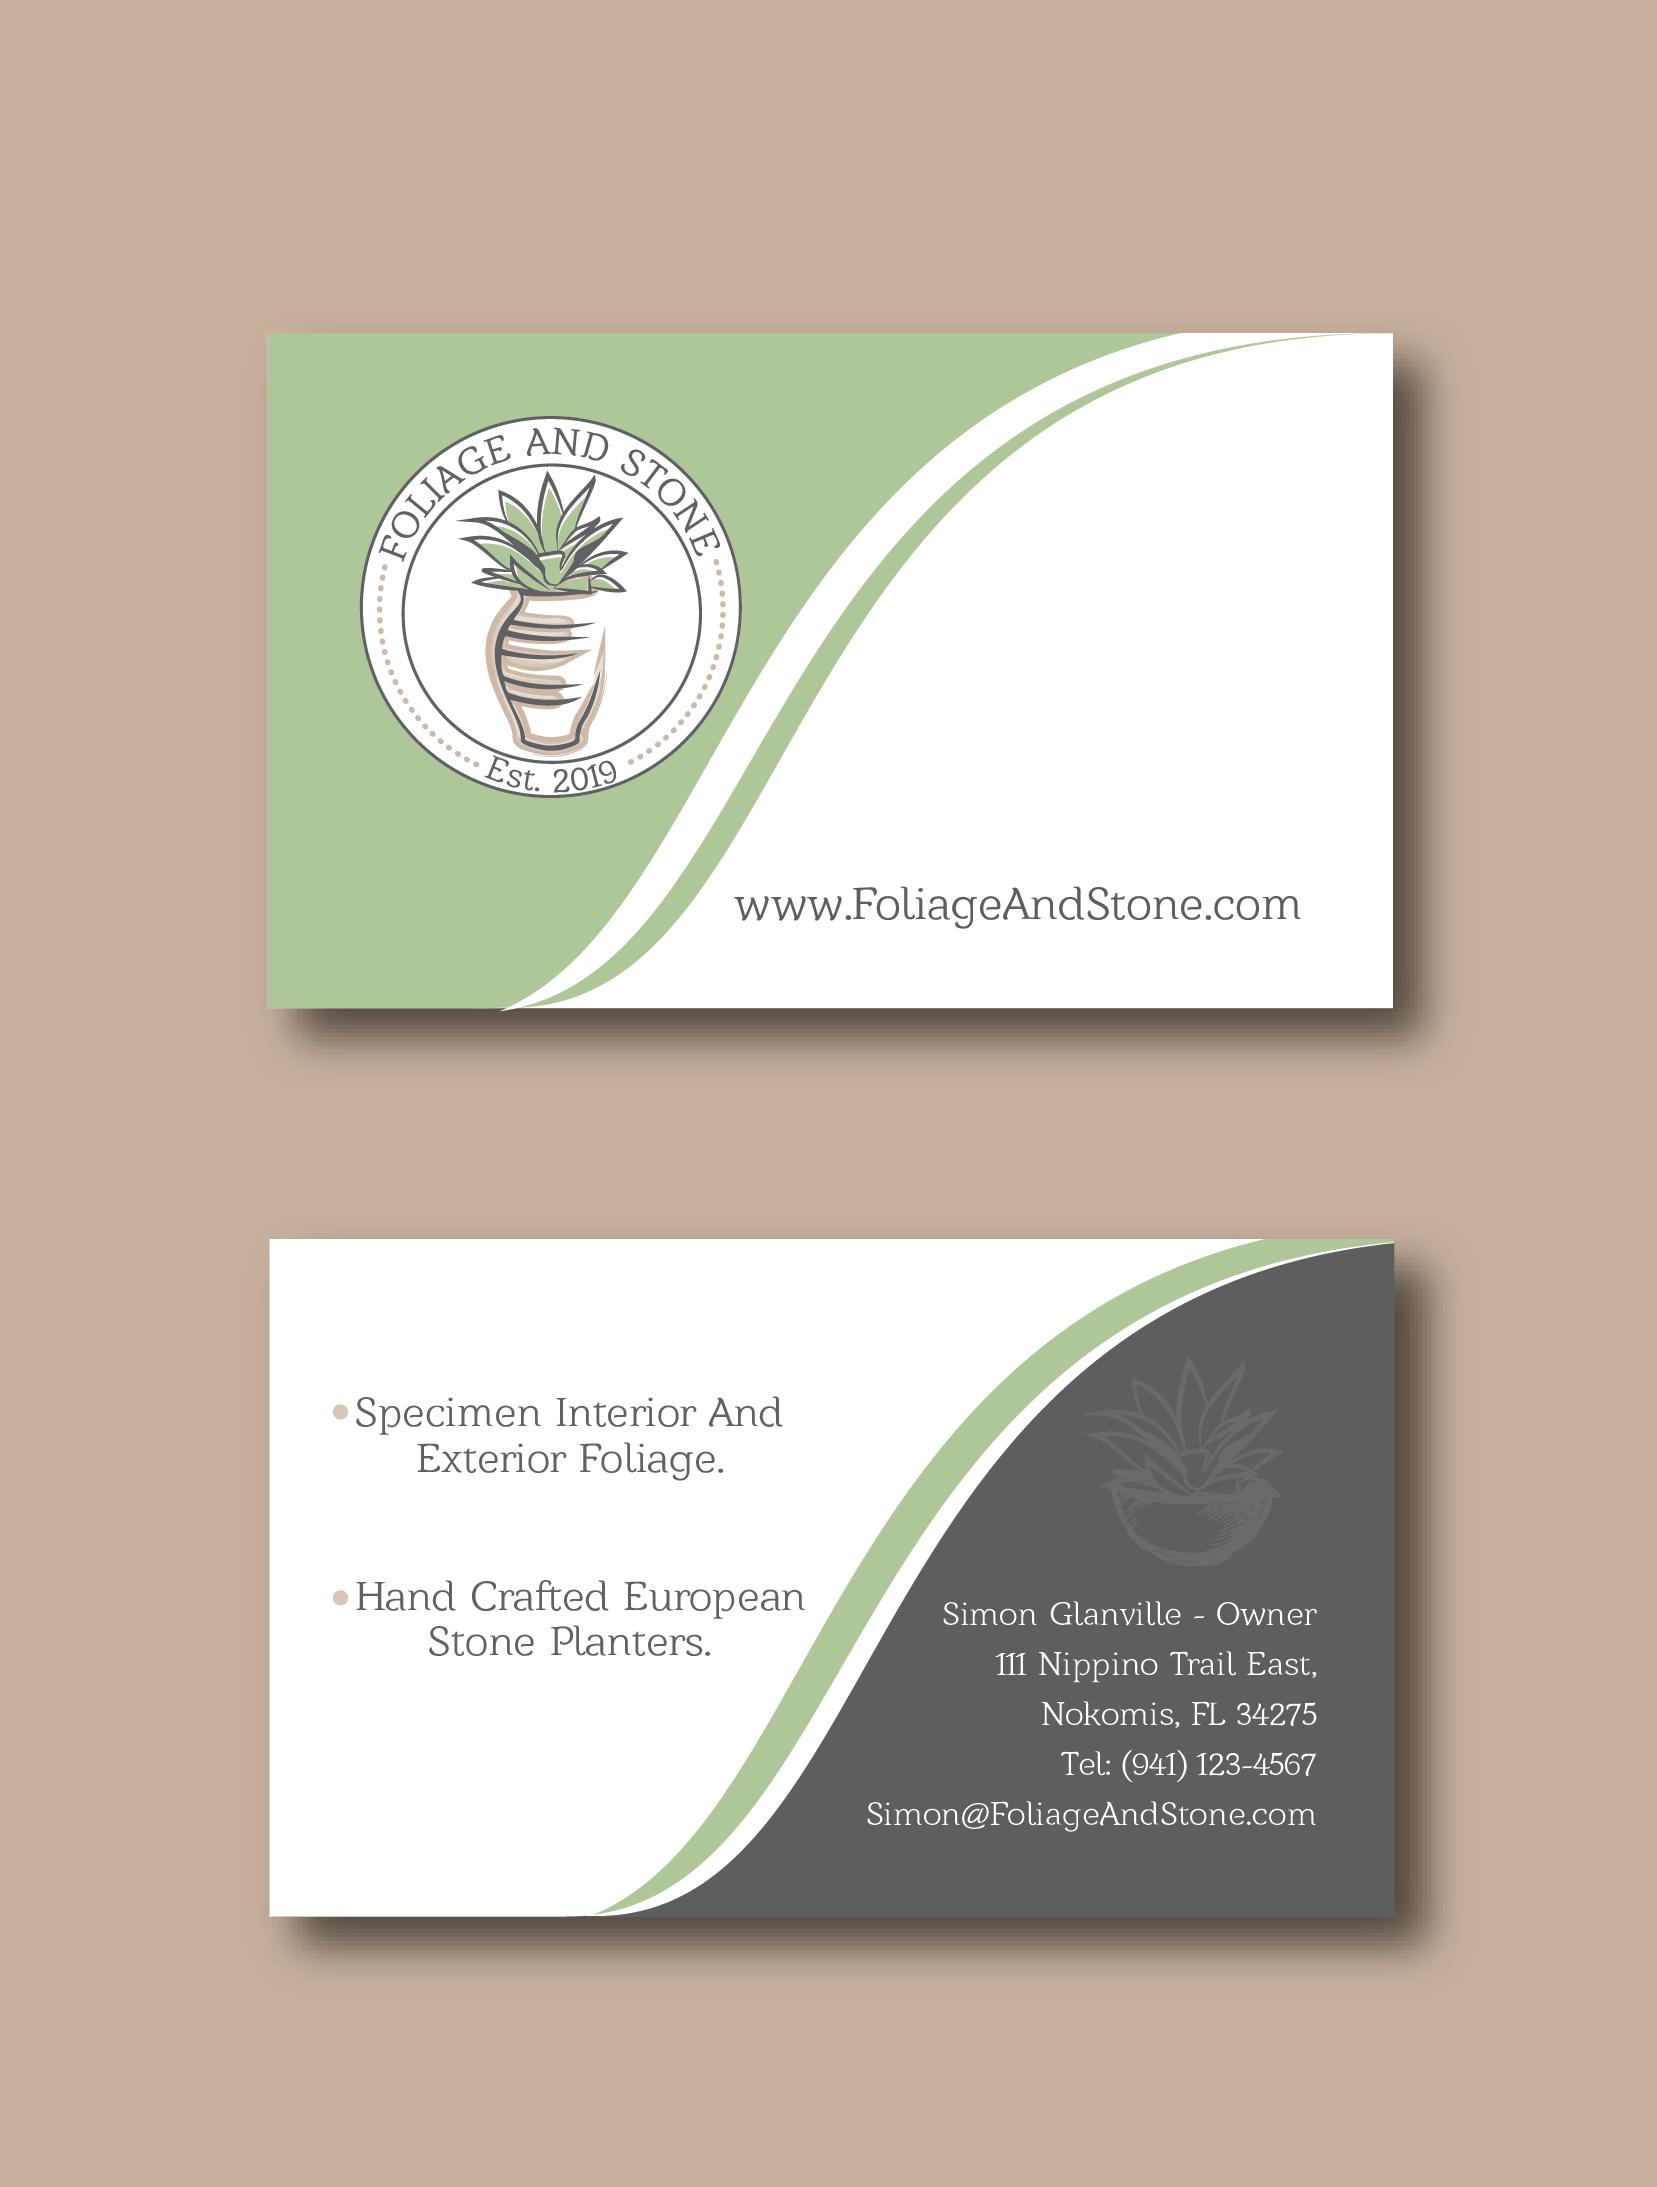 Business Card Design - Foliage And Stone